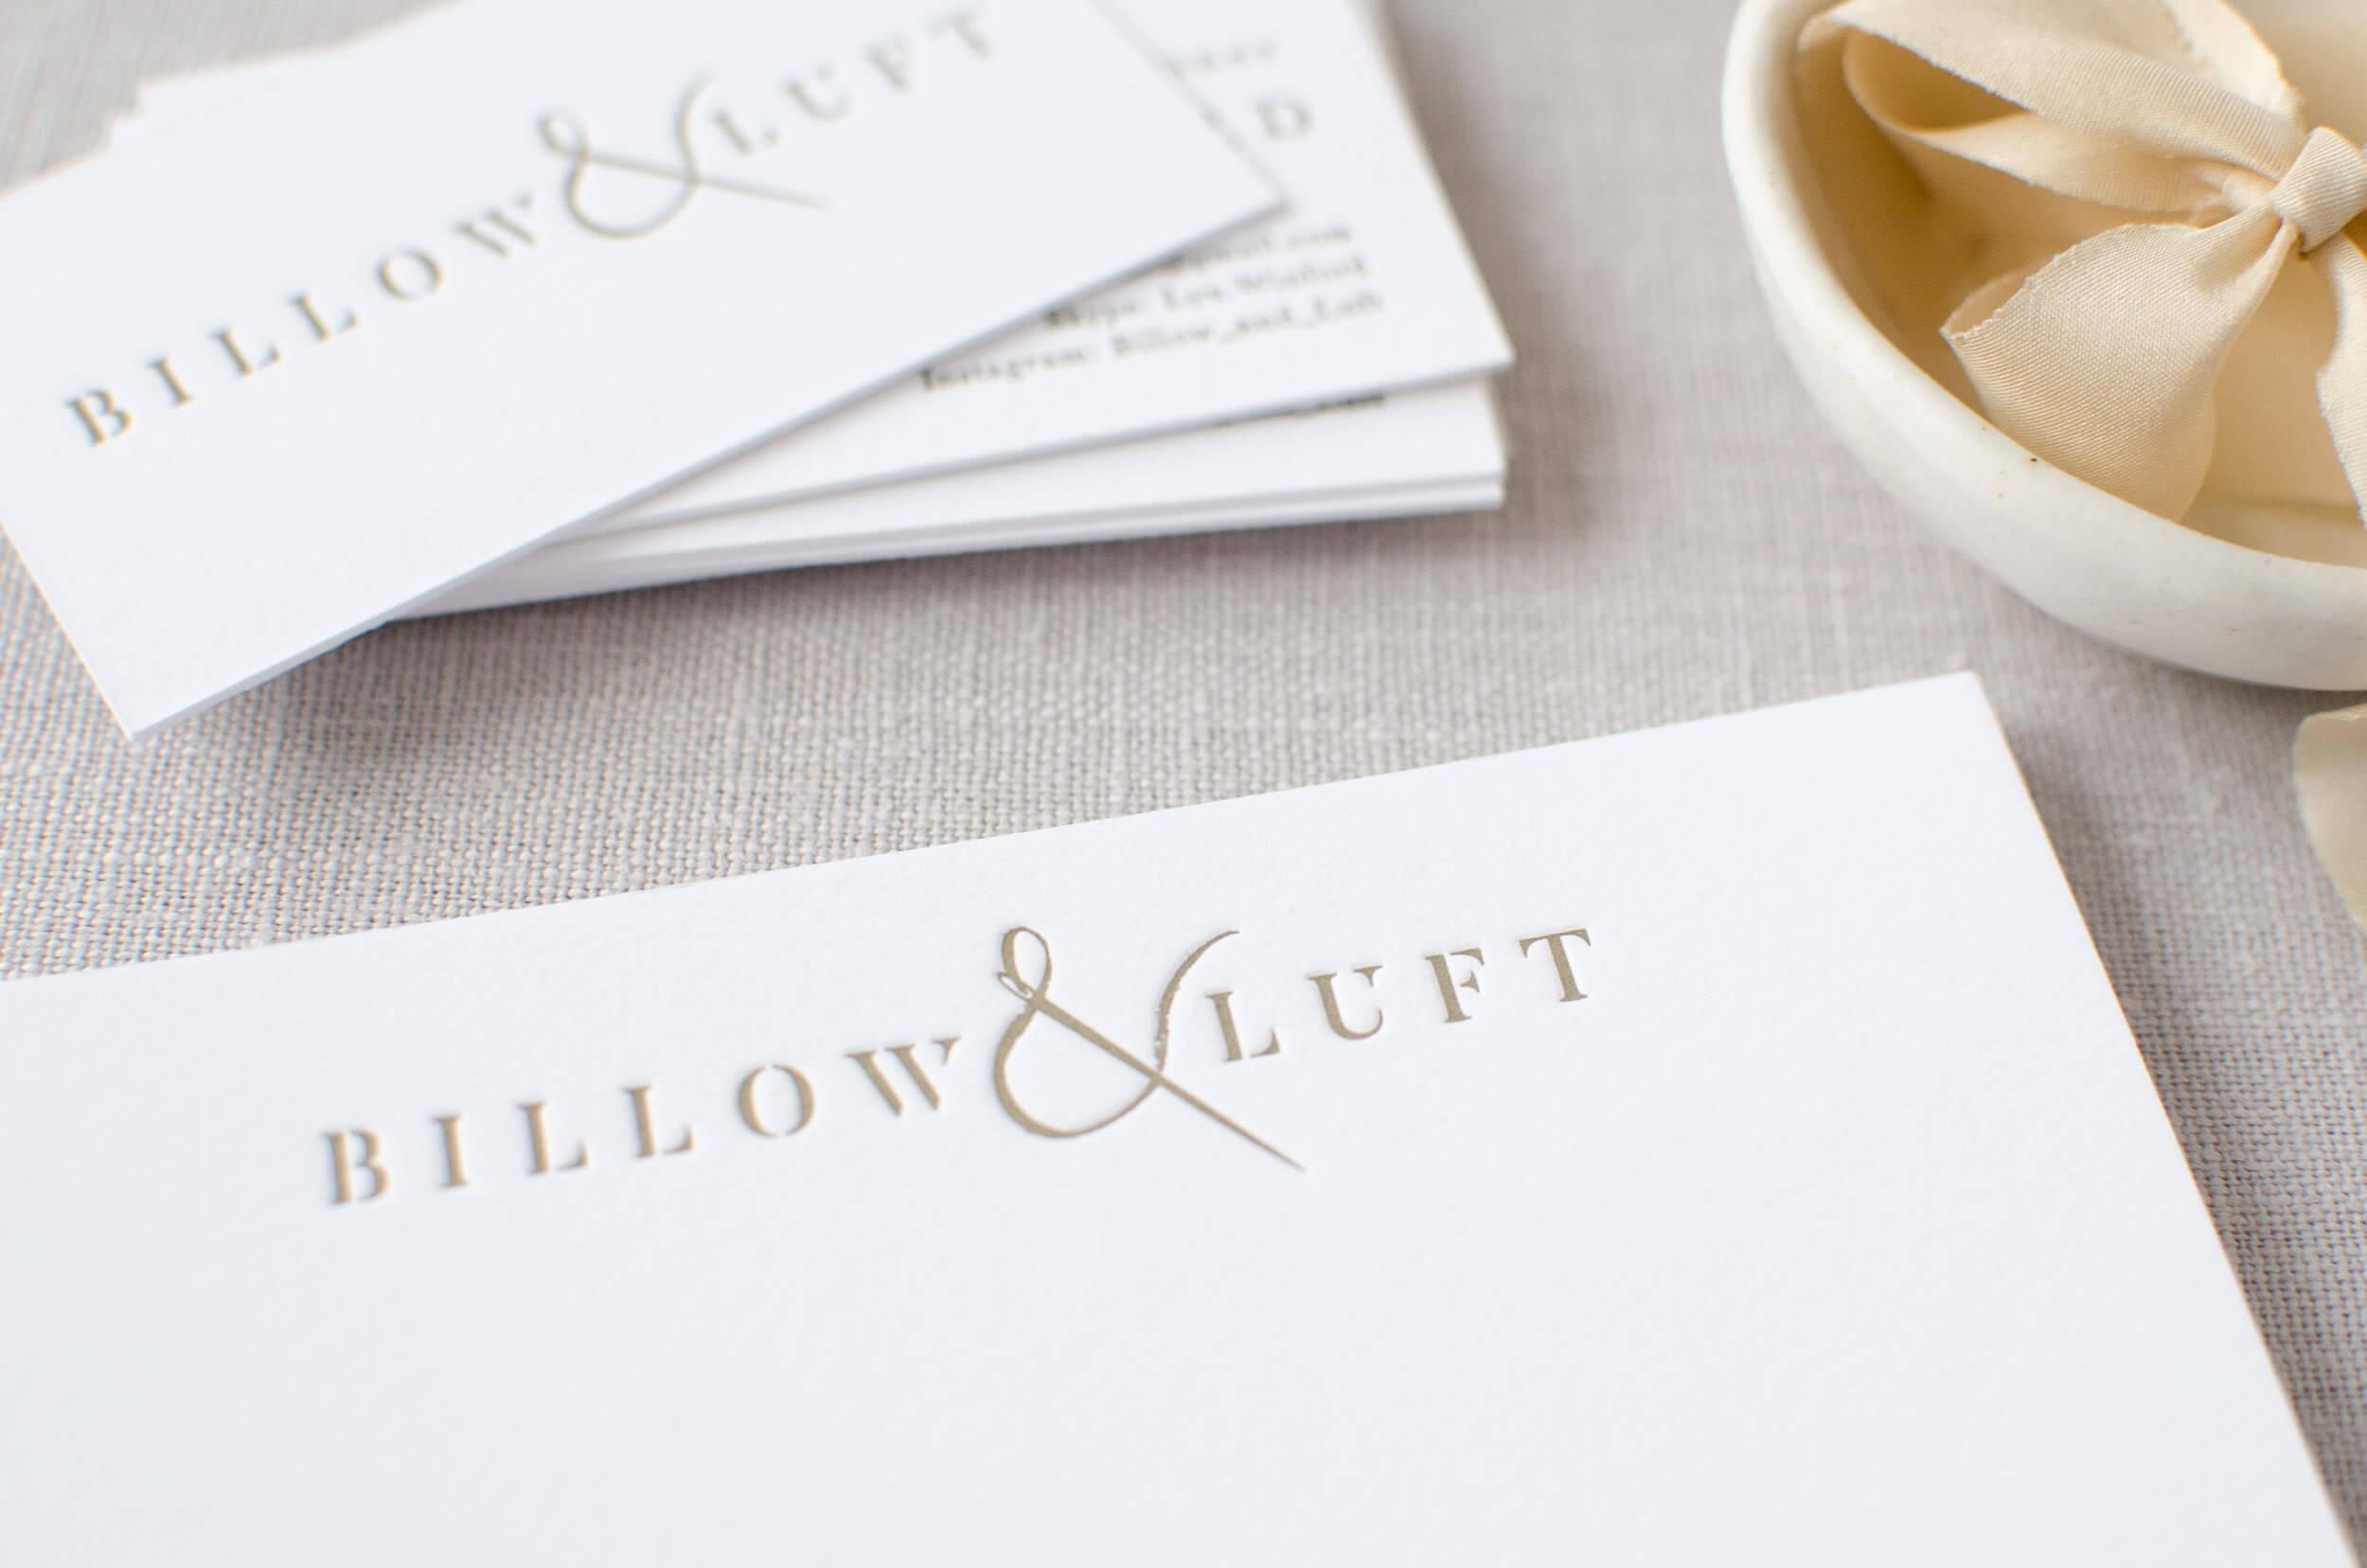 letterpress-gold-ink-branding-billow-luft-3.jpg